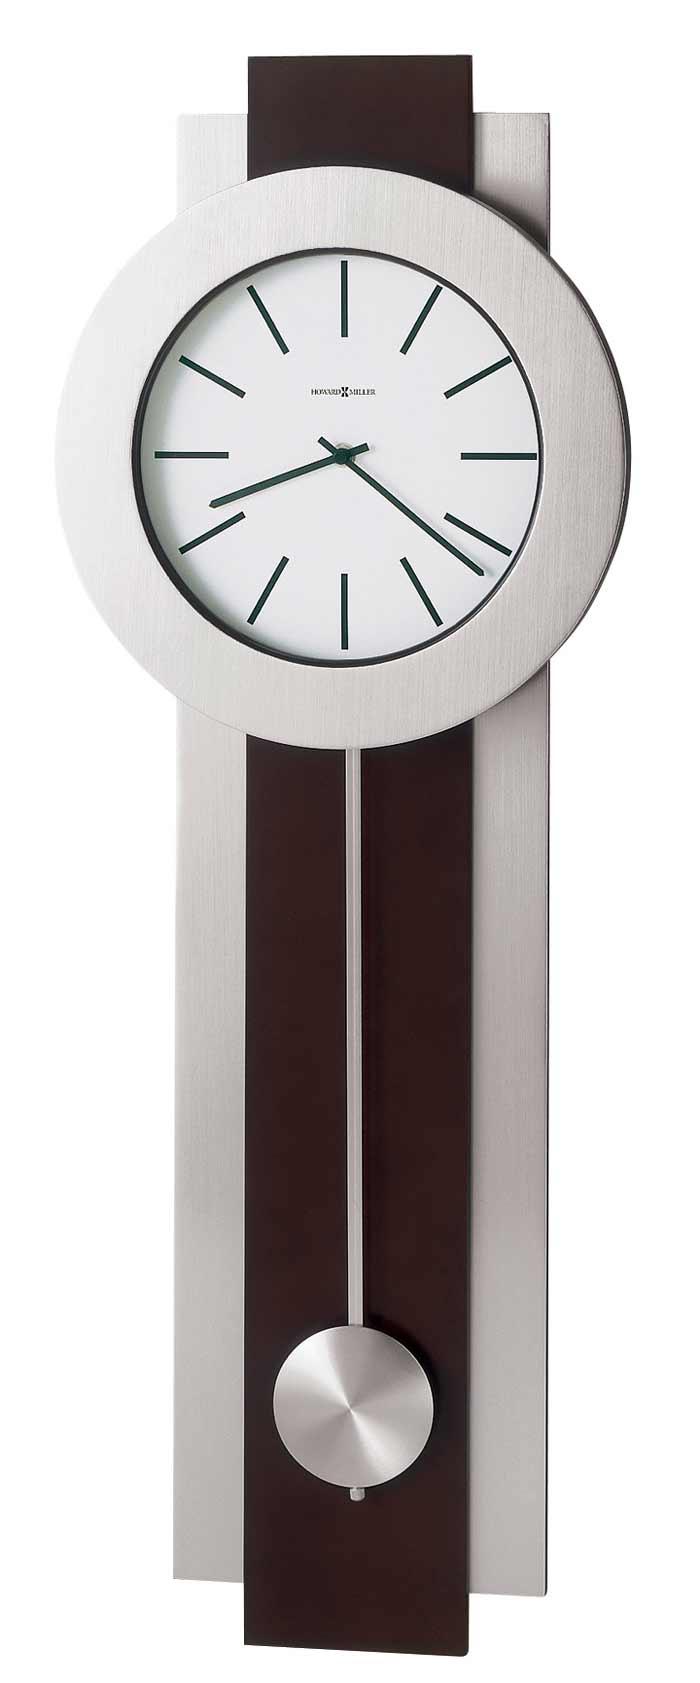 Designer Wall Clocks contemporary wall clocks and modern wall clocks - the clock depot